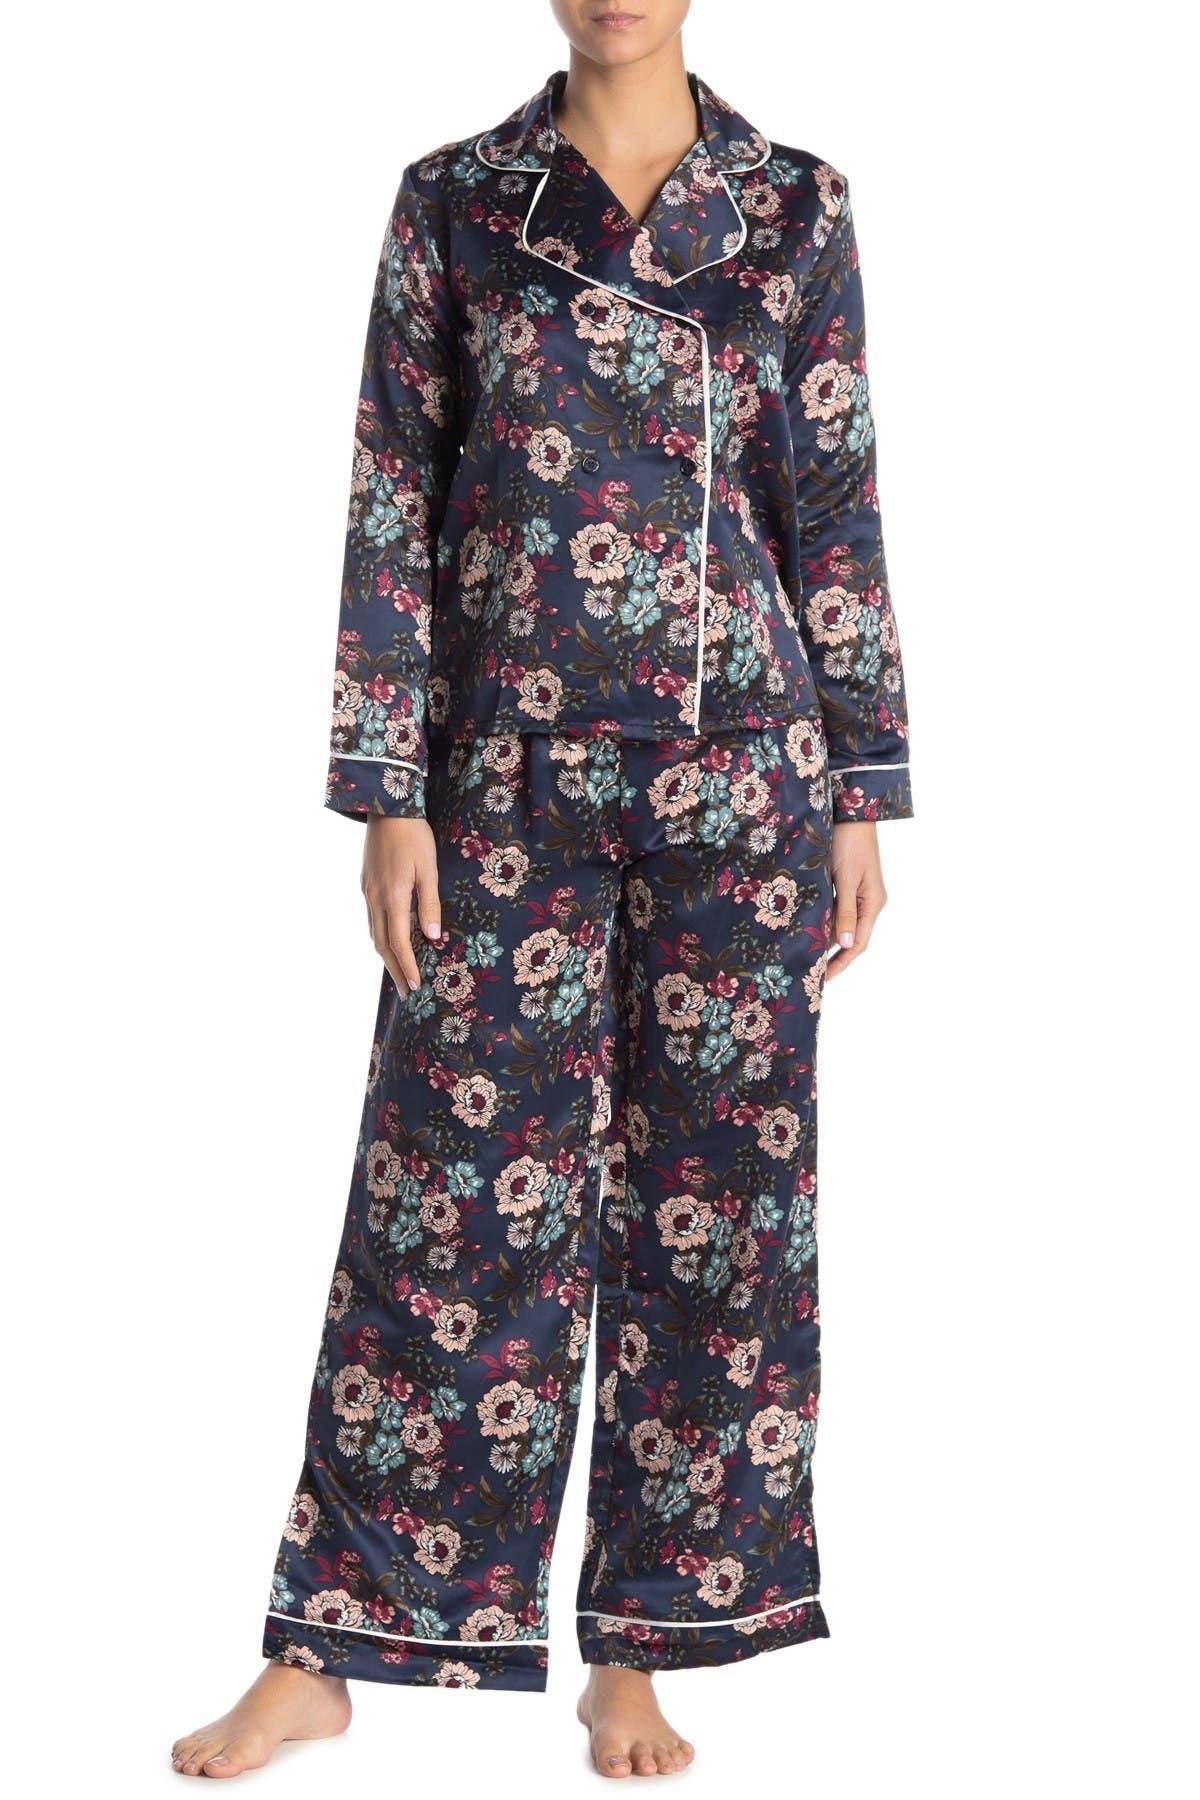 Image of Nanette Lepore Floral Satin Long Sleeve Top & Pants 2-Piece Pajama Set